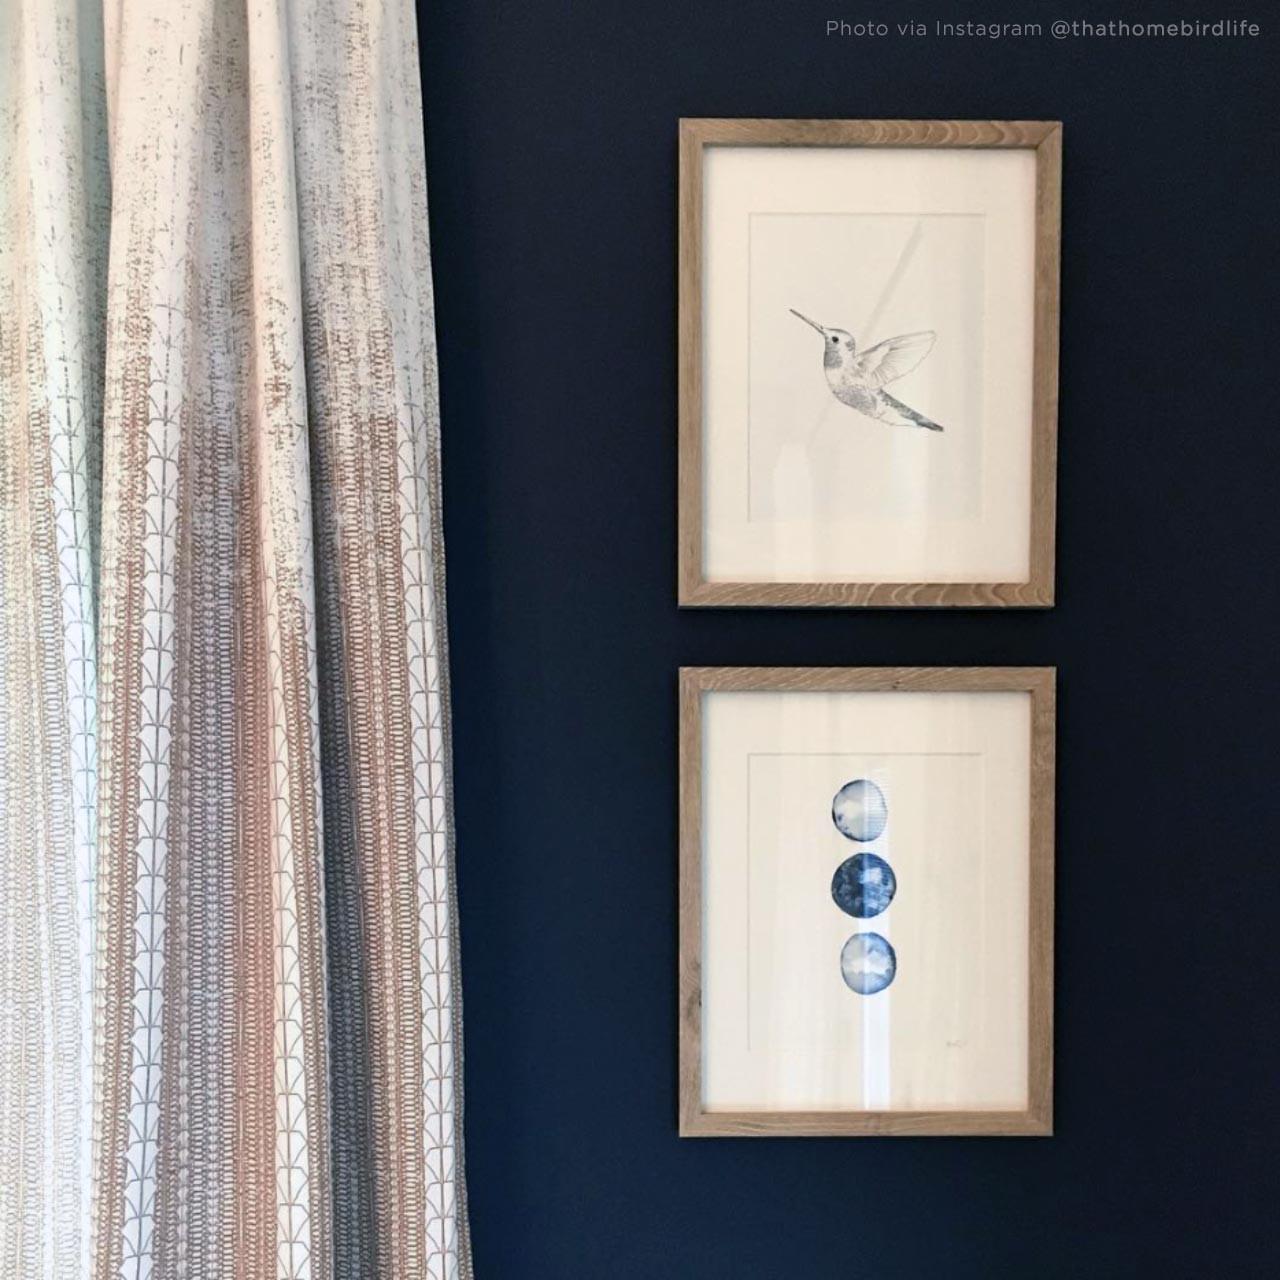 'Hummingbird' Hand-Drawn Art Print from The Printed Home (Photo Credit: @thathomebirdlife via Instagram